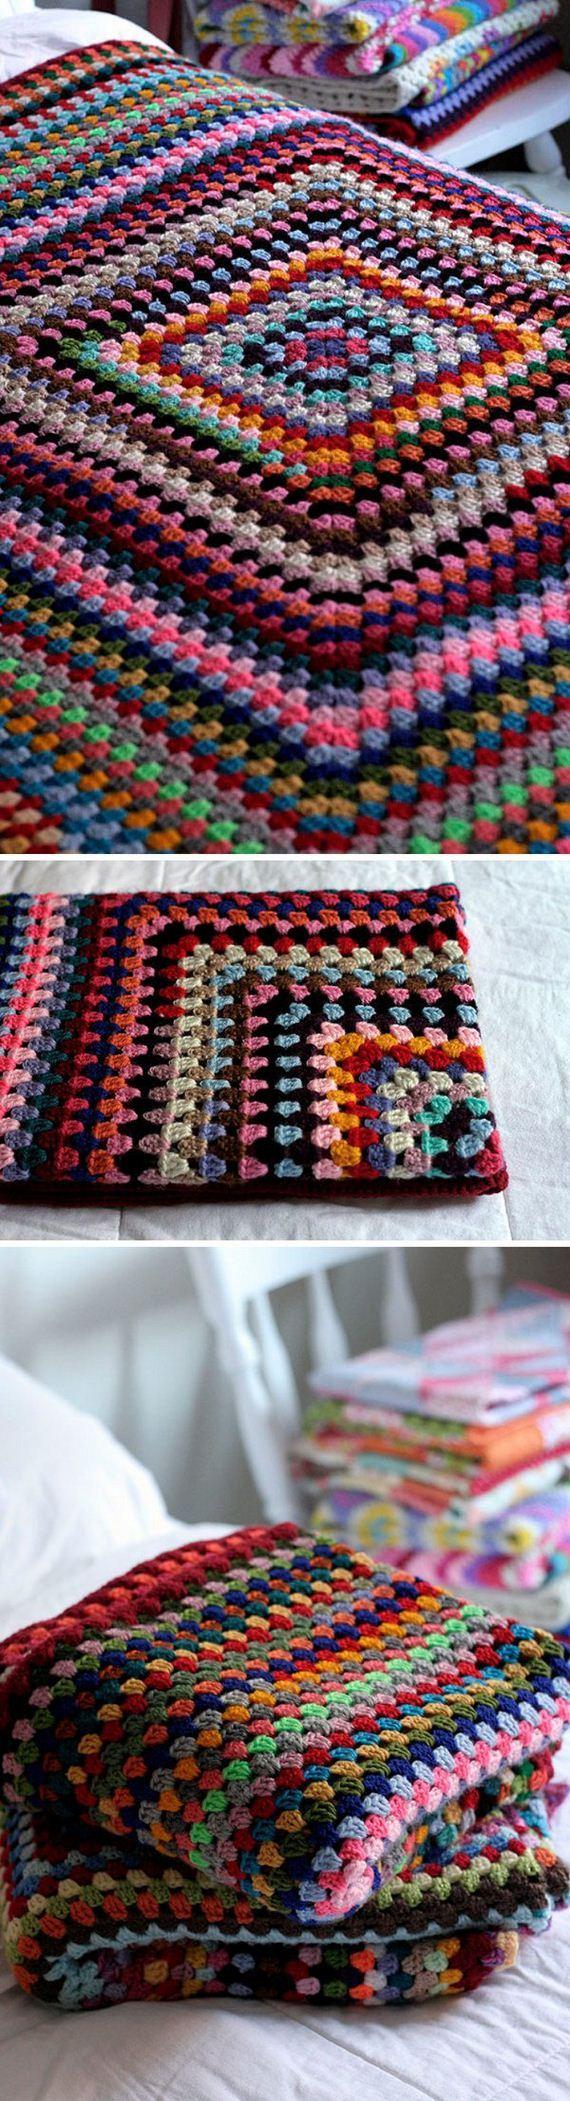 02-crochet-blankets